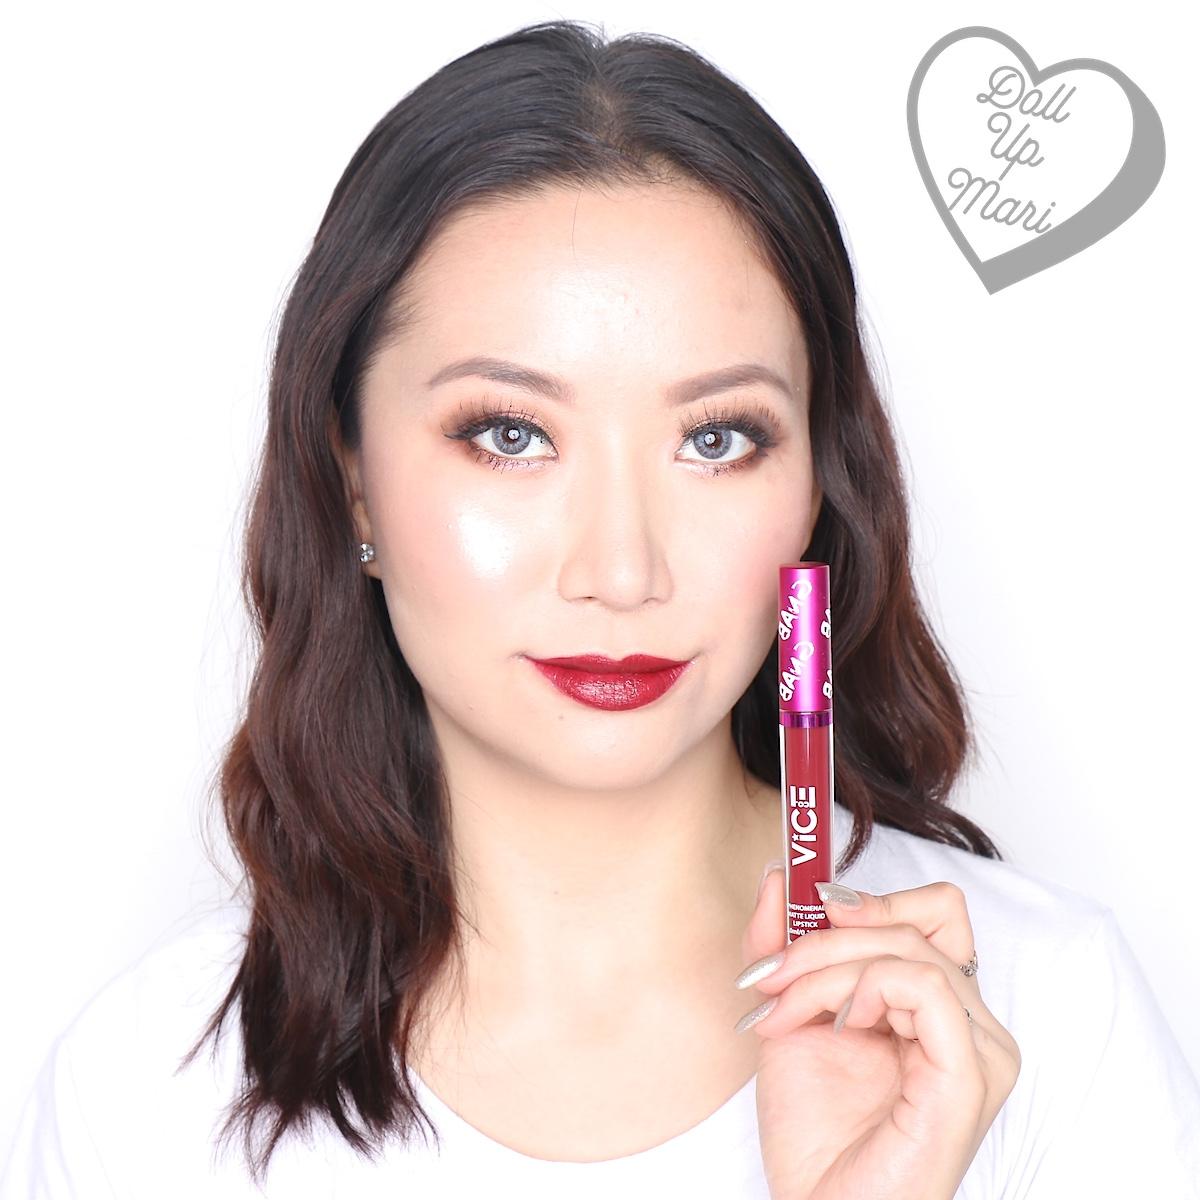 Mari wearing the Matte Liquid Lipstick of the Fashown set of Vice X Bang Lip set collection